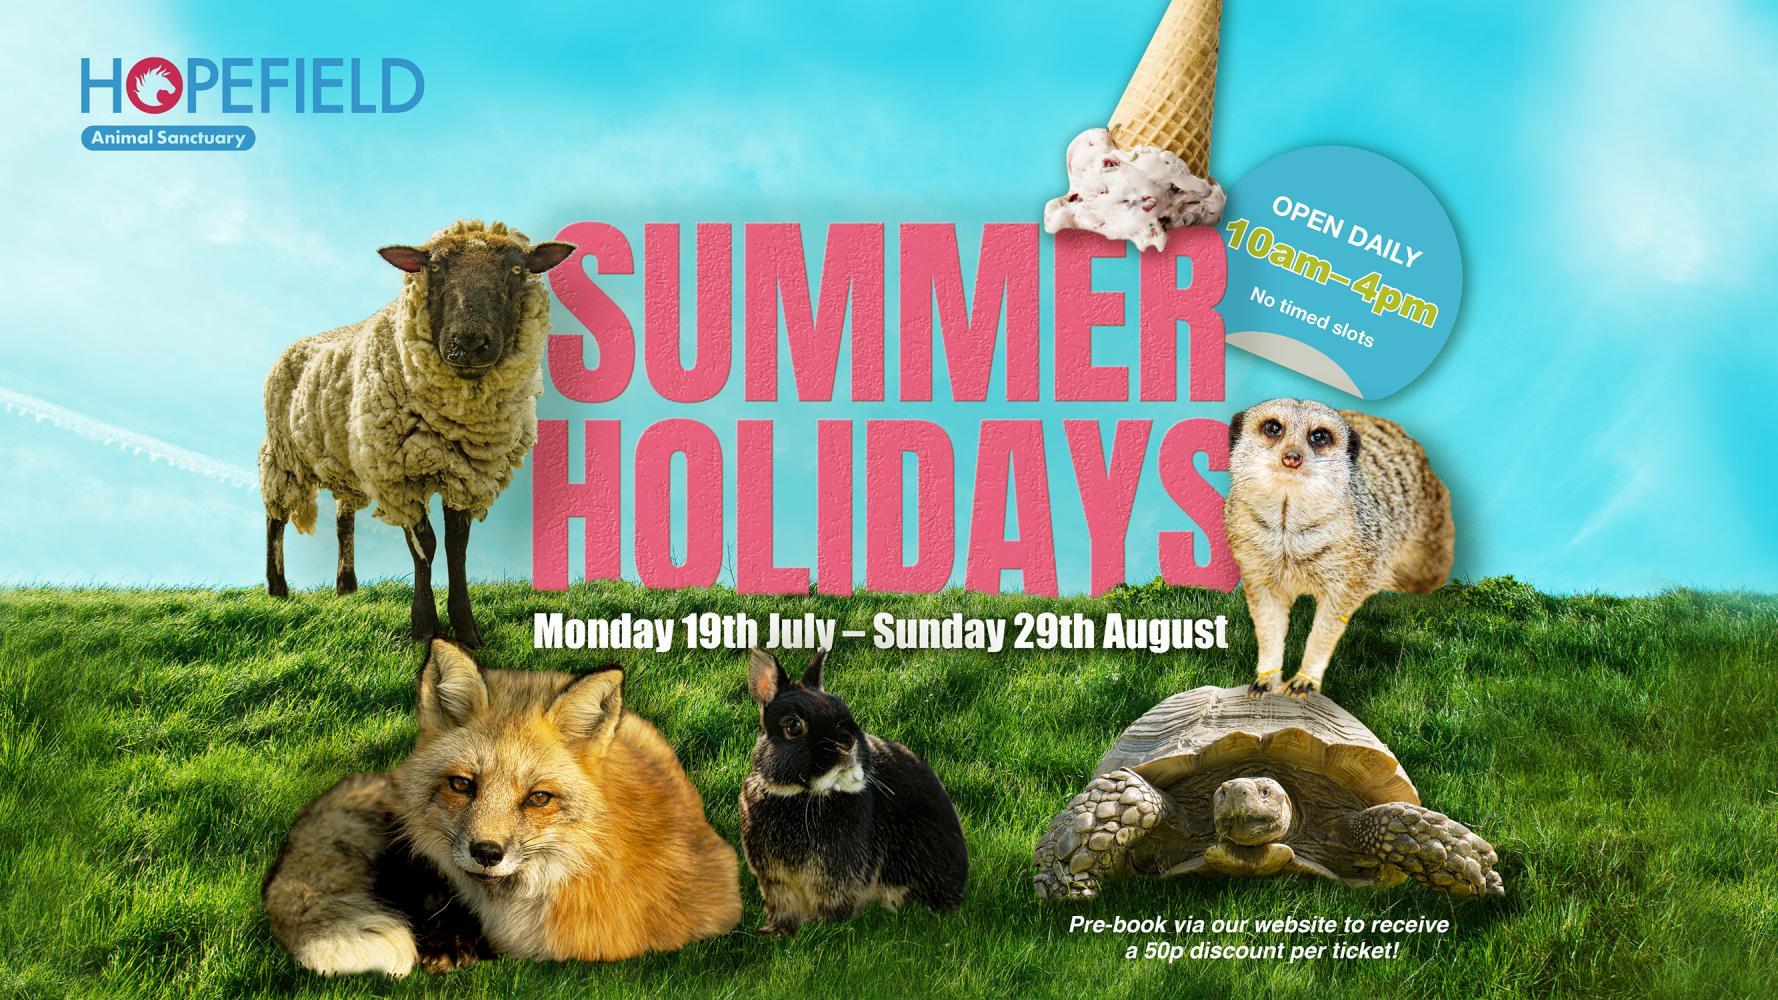 Summer Holidays at Hopefield